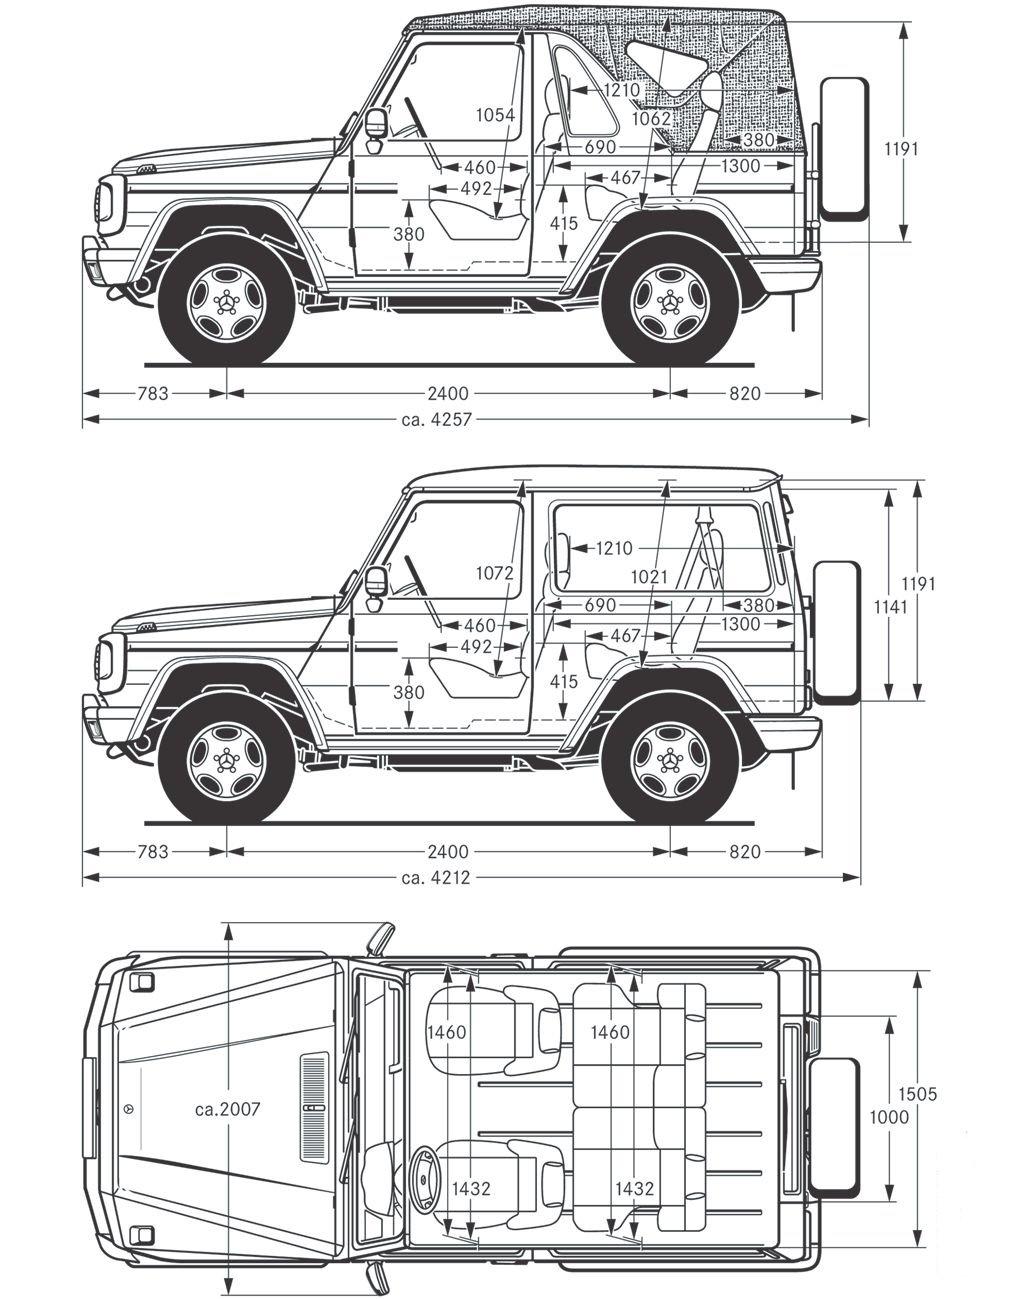 15-dimensions-interieures-version-break-court-mercedes-classe-g-463.jpg